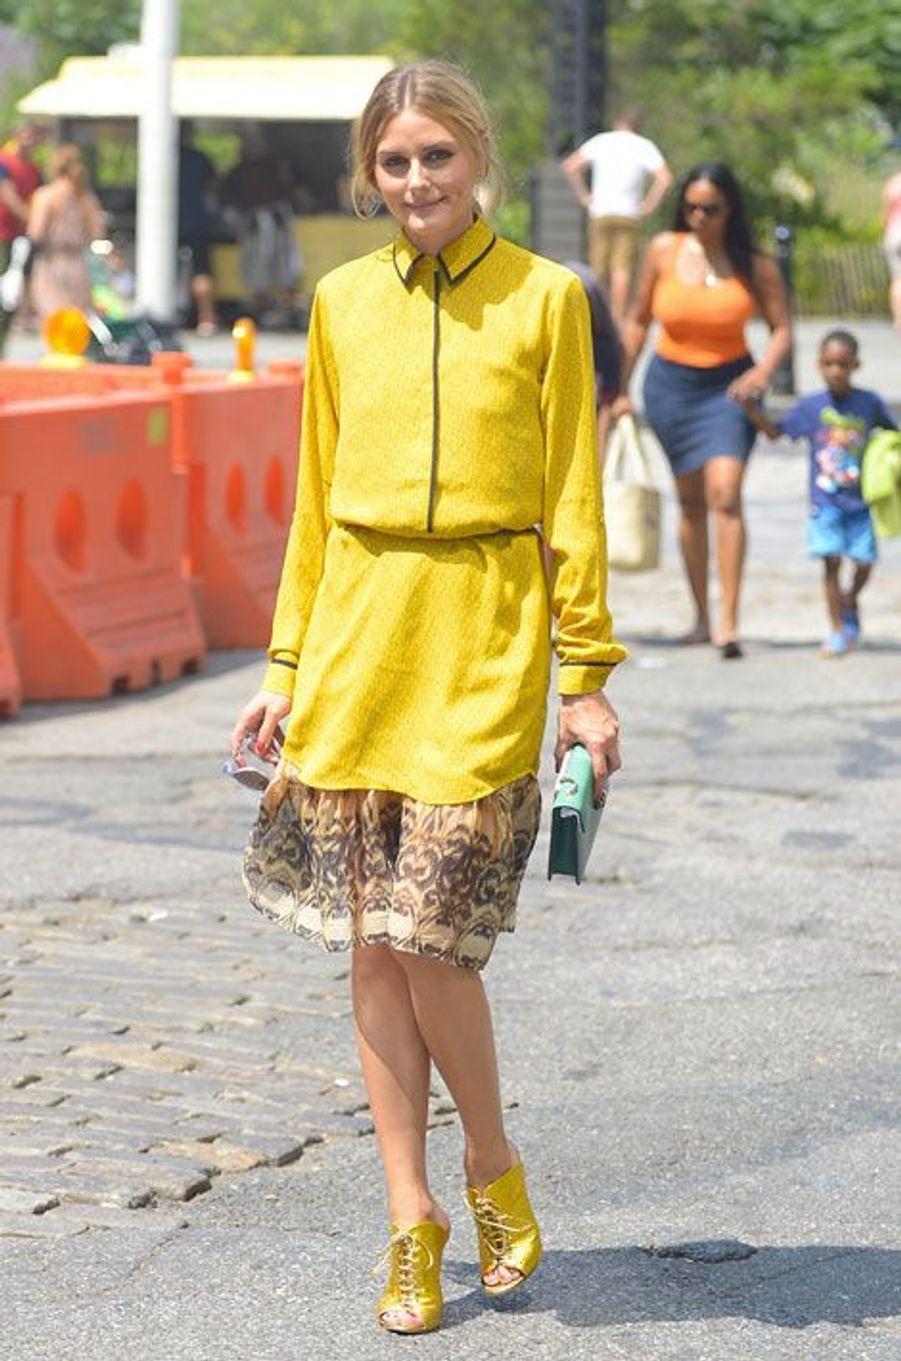 La styliste Olivia Palermo à Brooklyn, le 23 août 2014